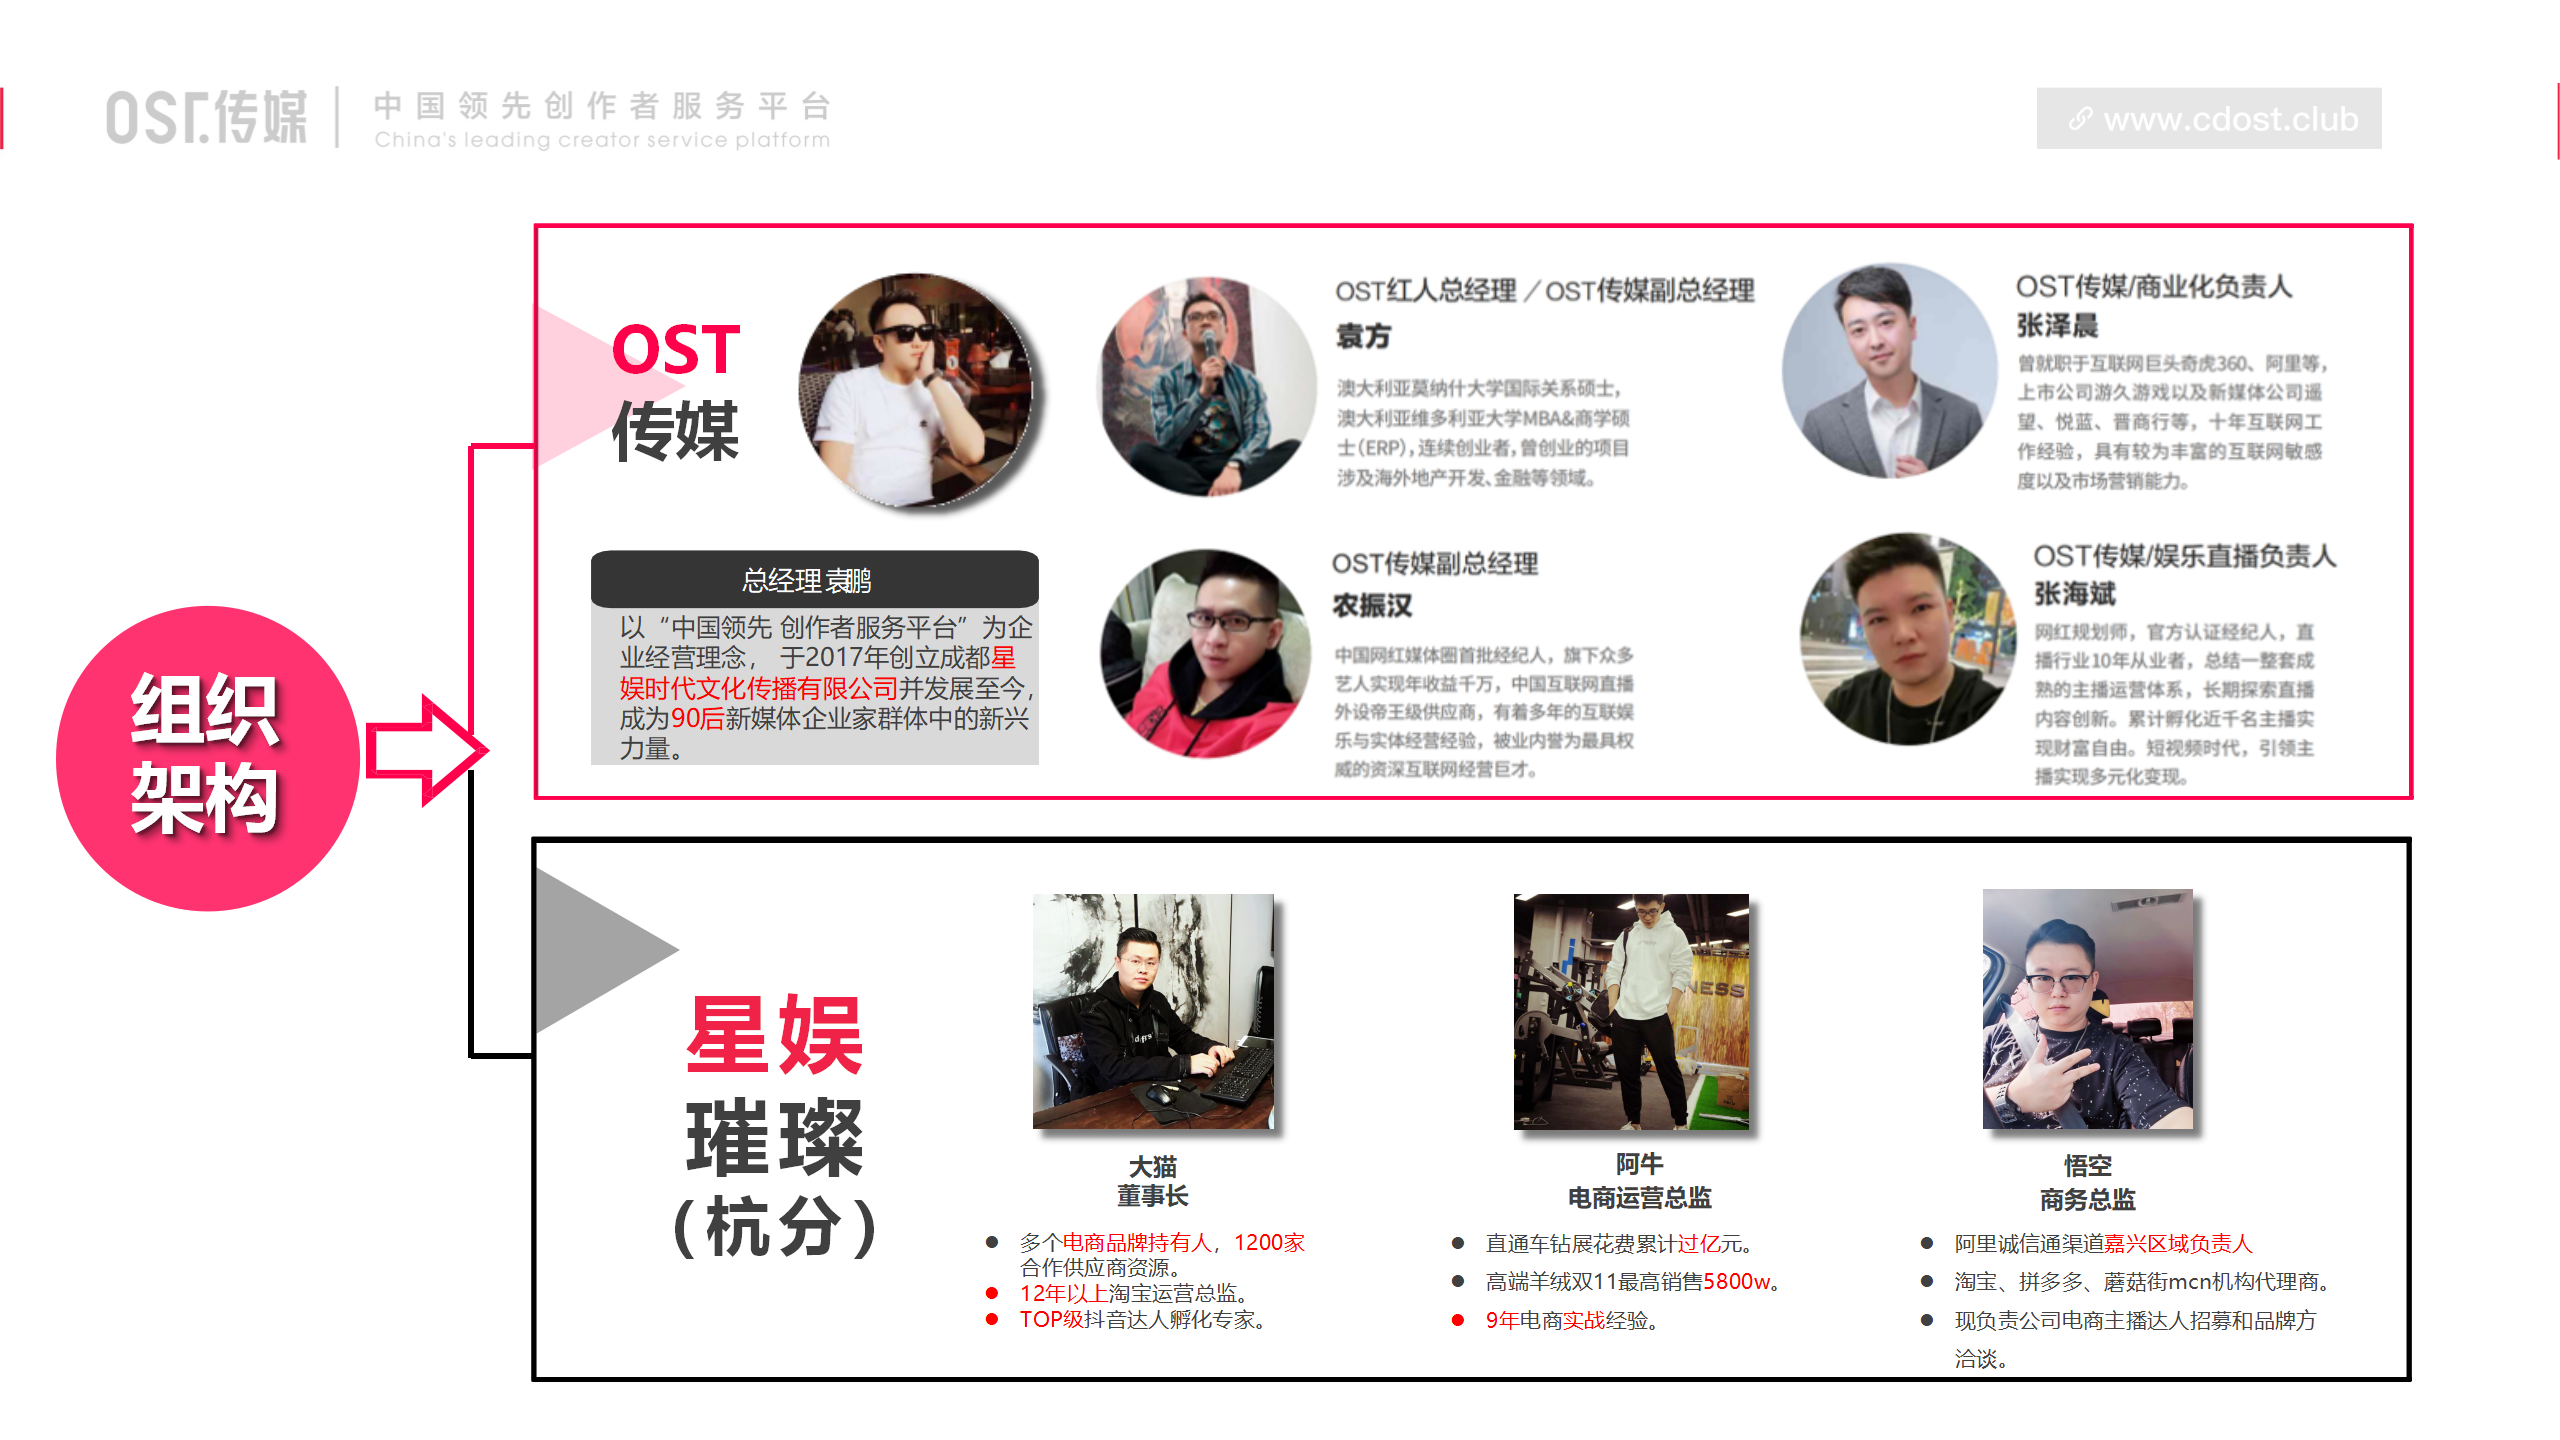 OST传媒电商业务介绍第11张